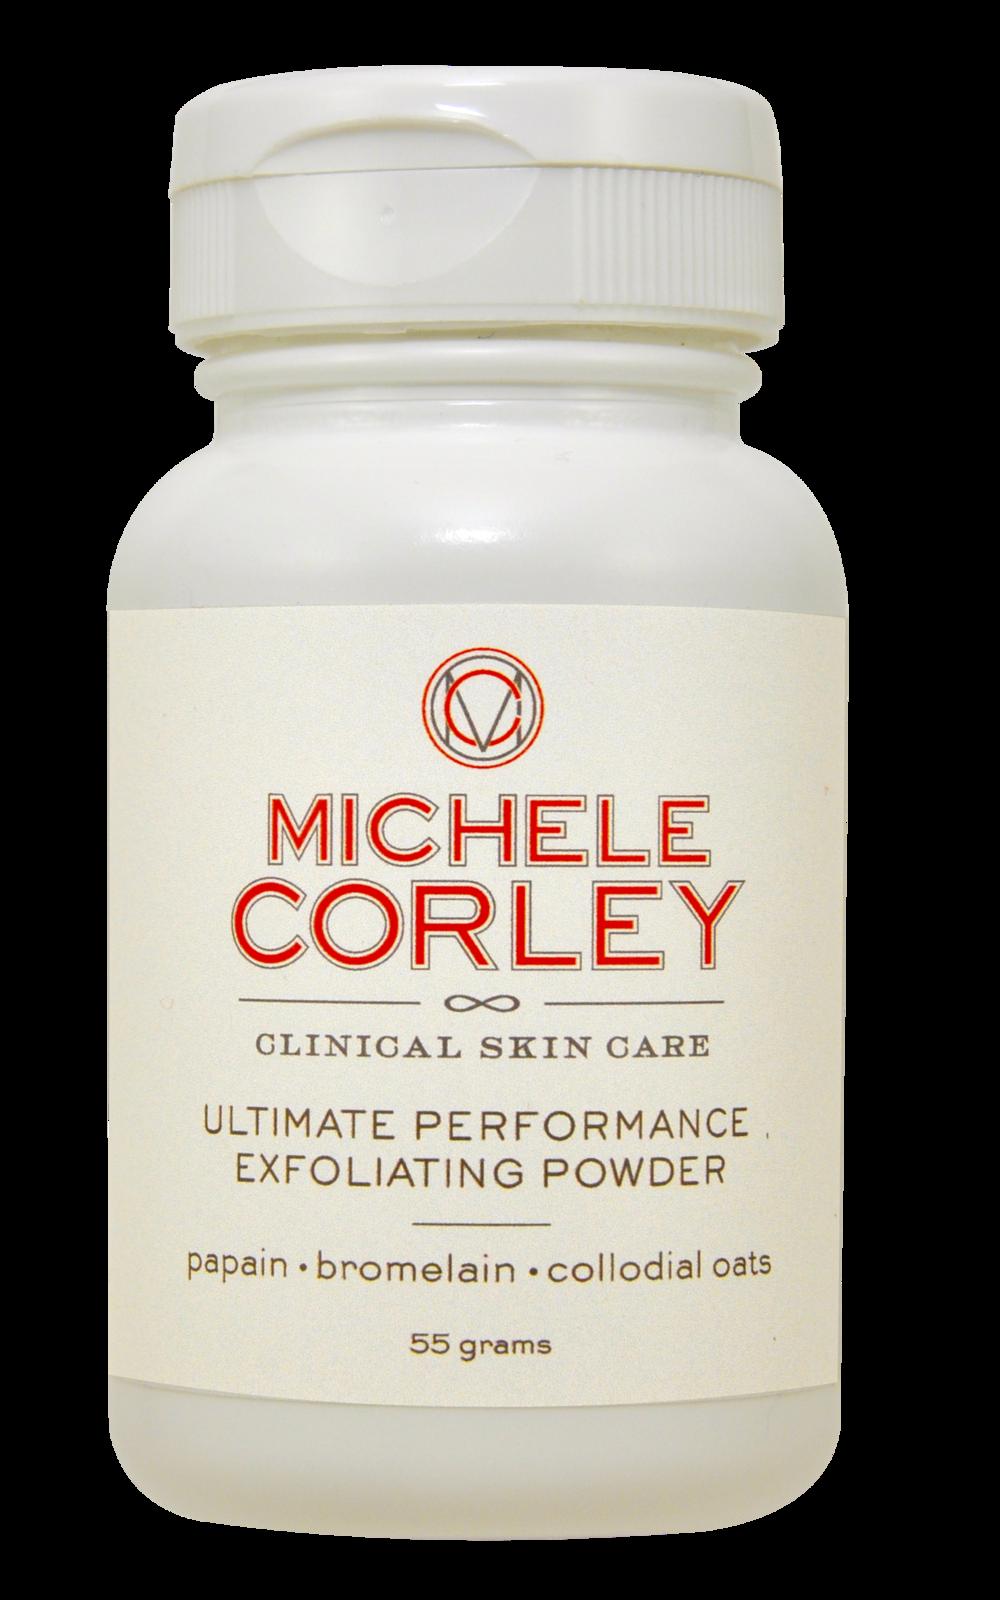 Ultimate Performance Exfoliating Powder